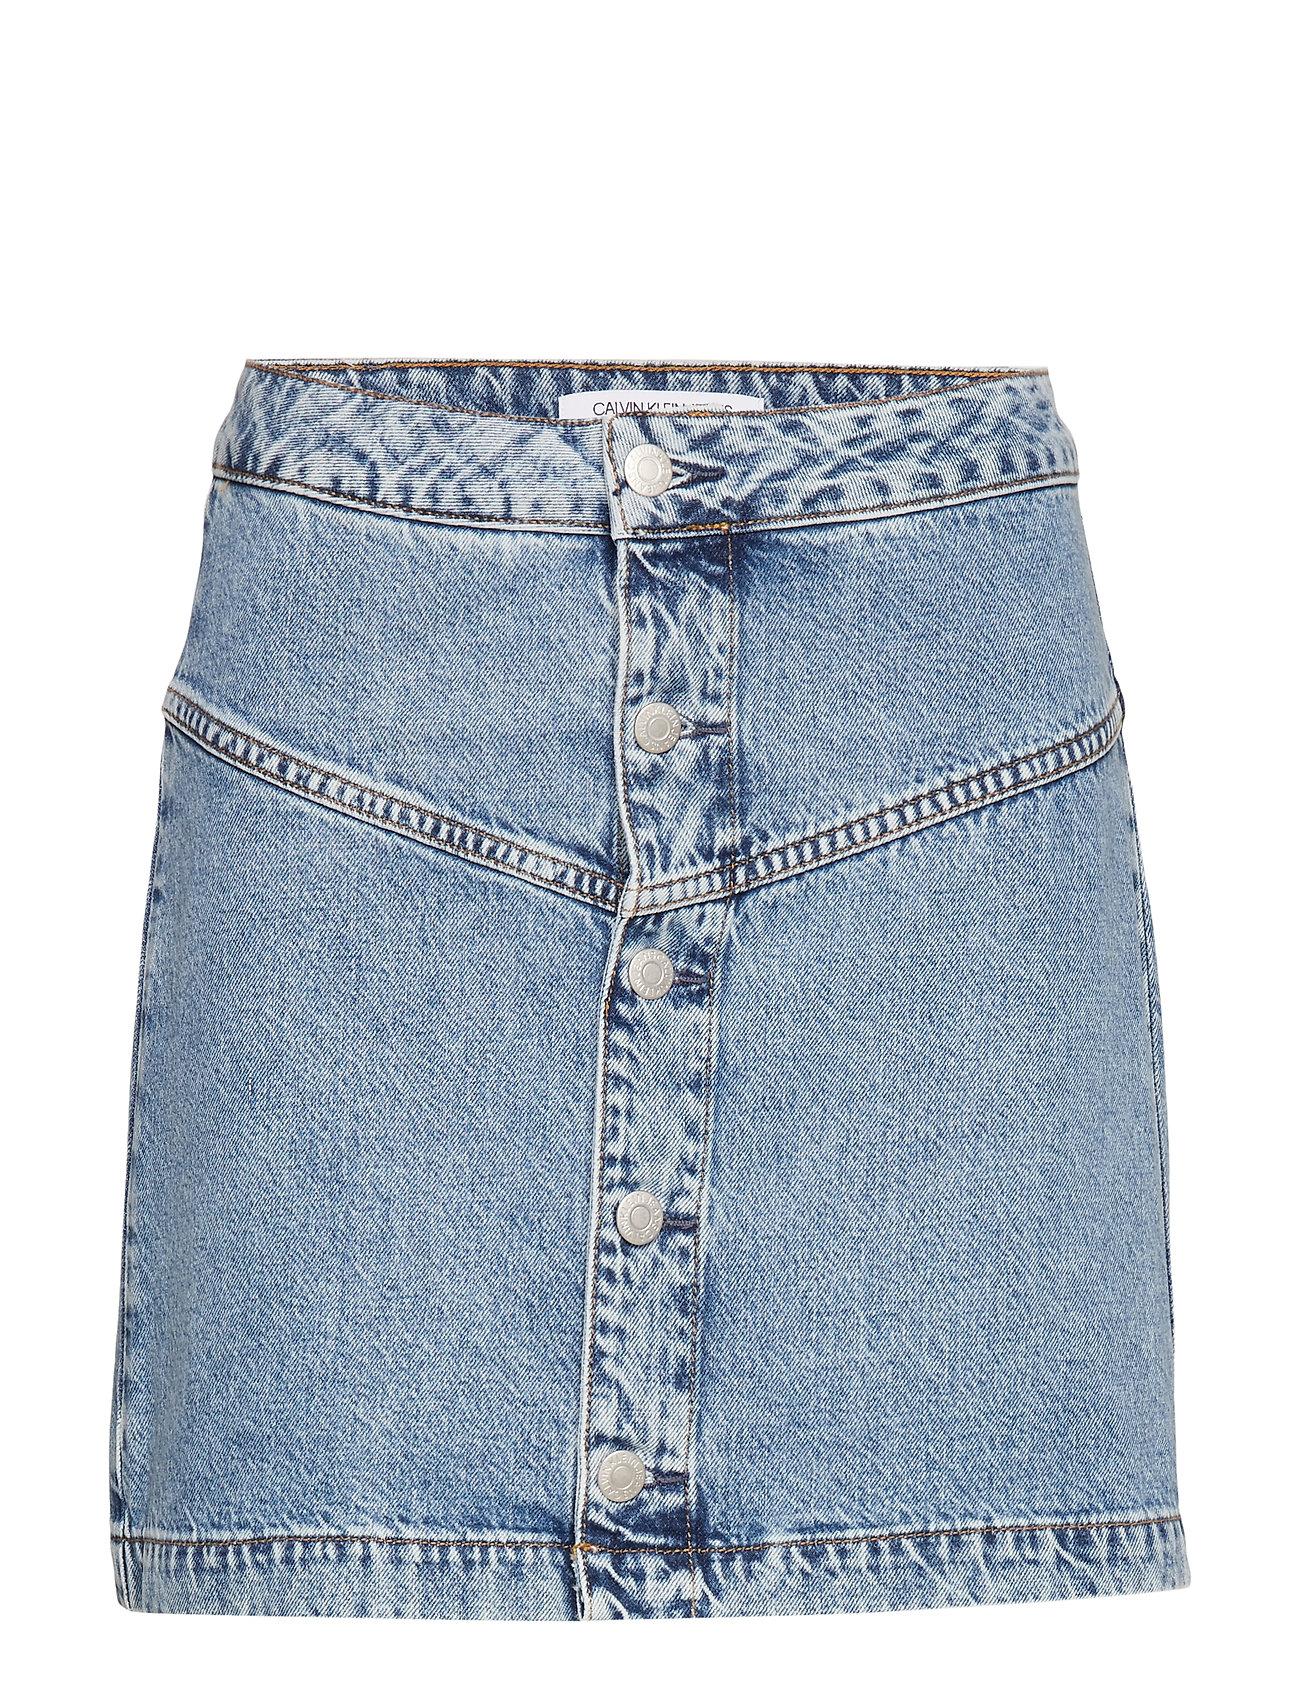 Calvin Klein Jeans BUTTON FRONT YOKE SK - AA016 LIGHT BLUE